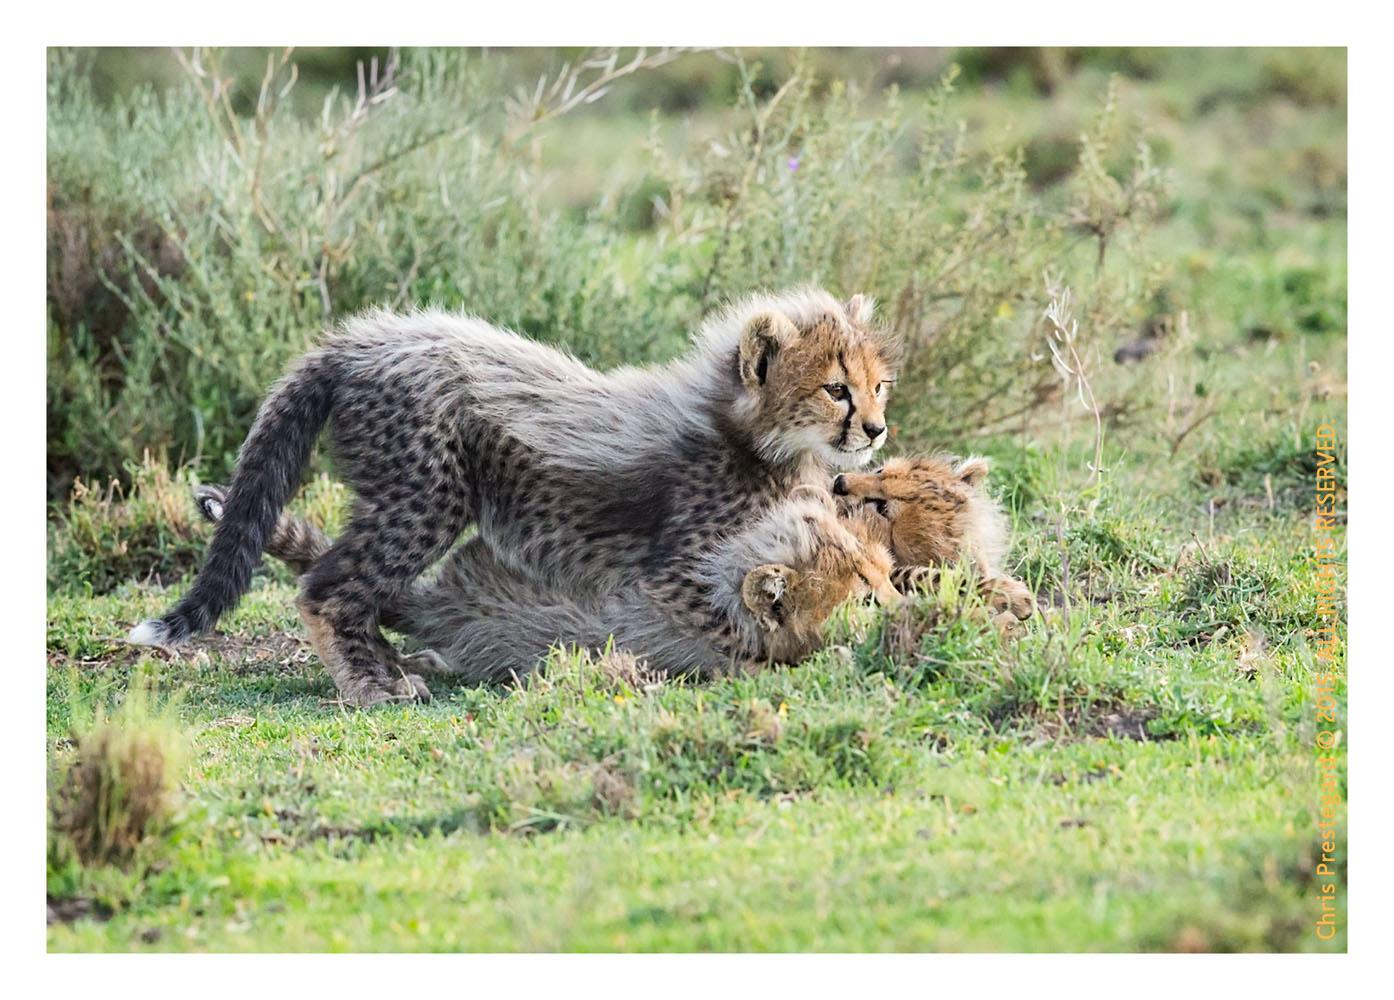 Cheetah 845